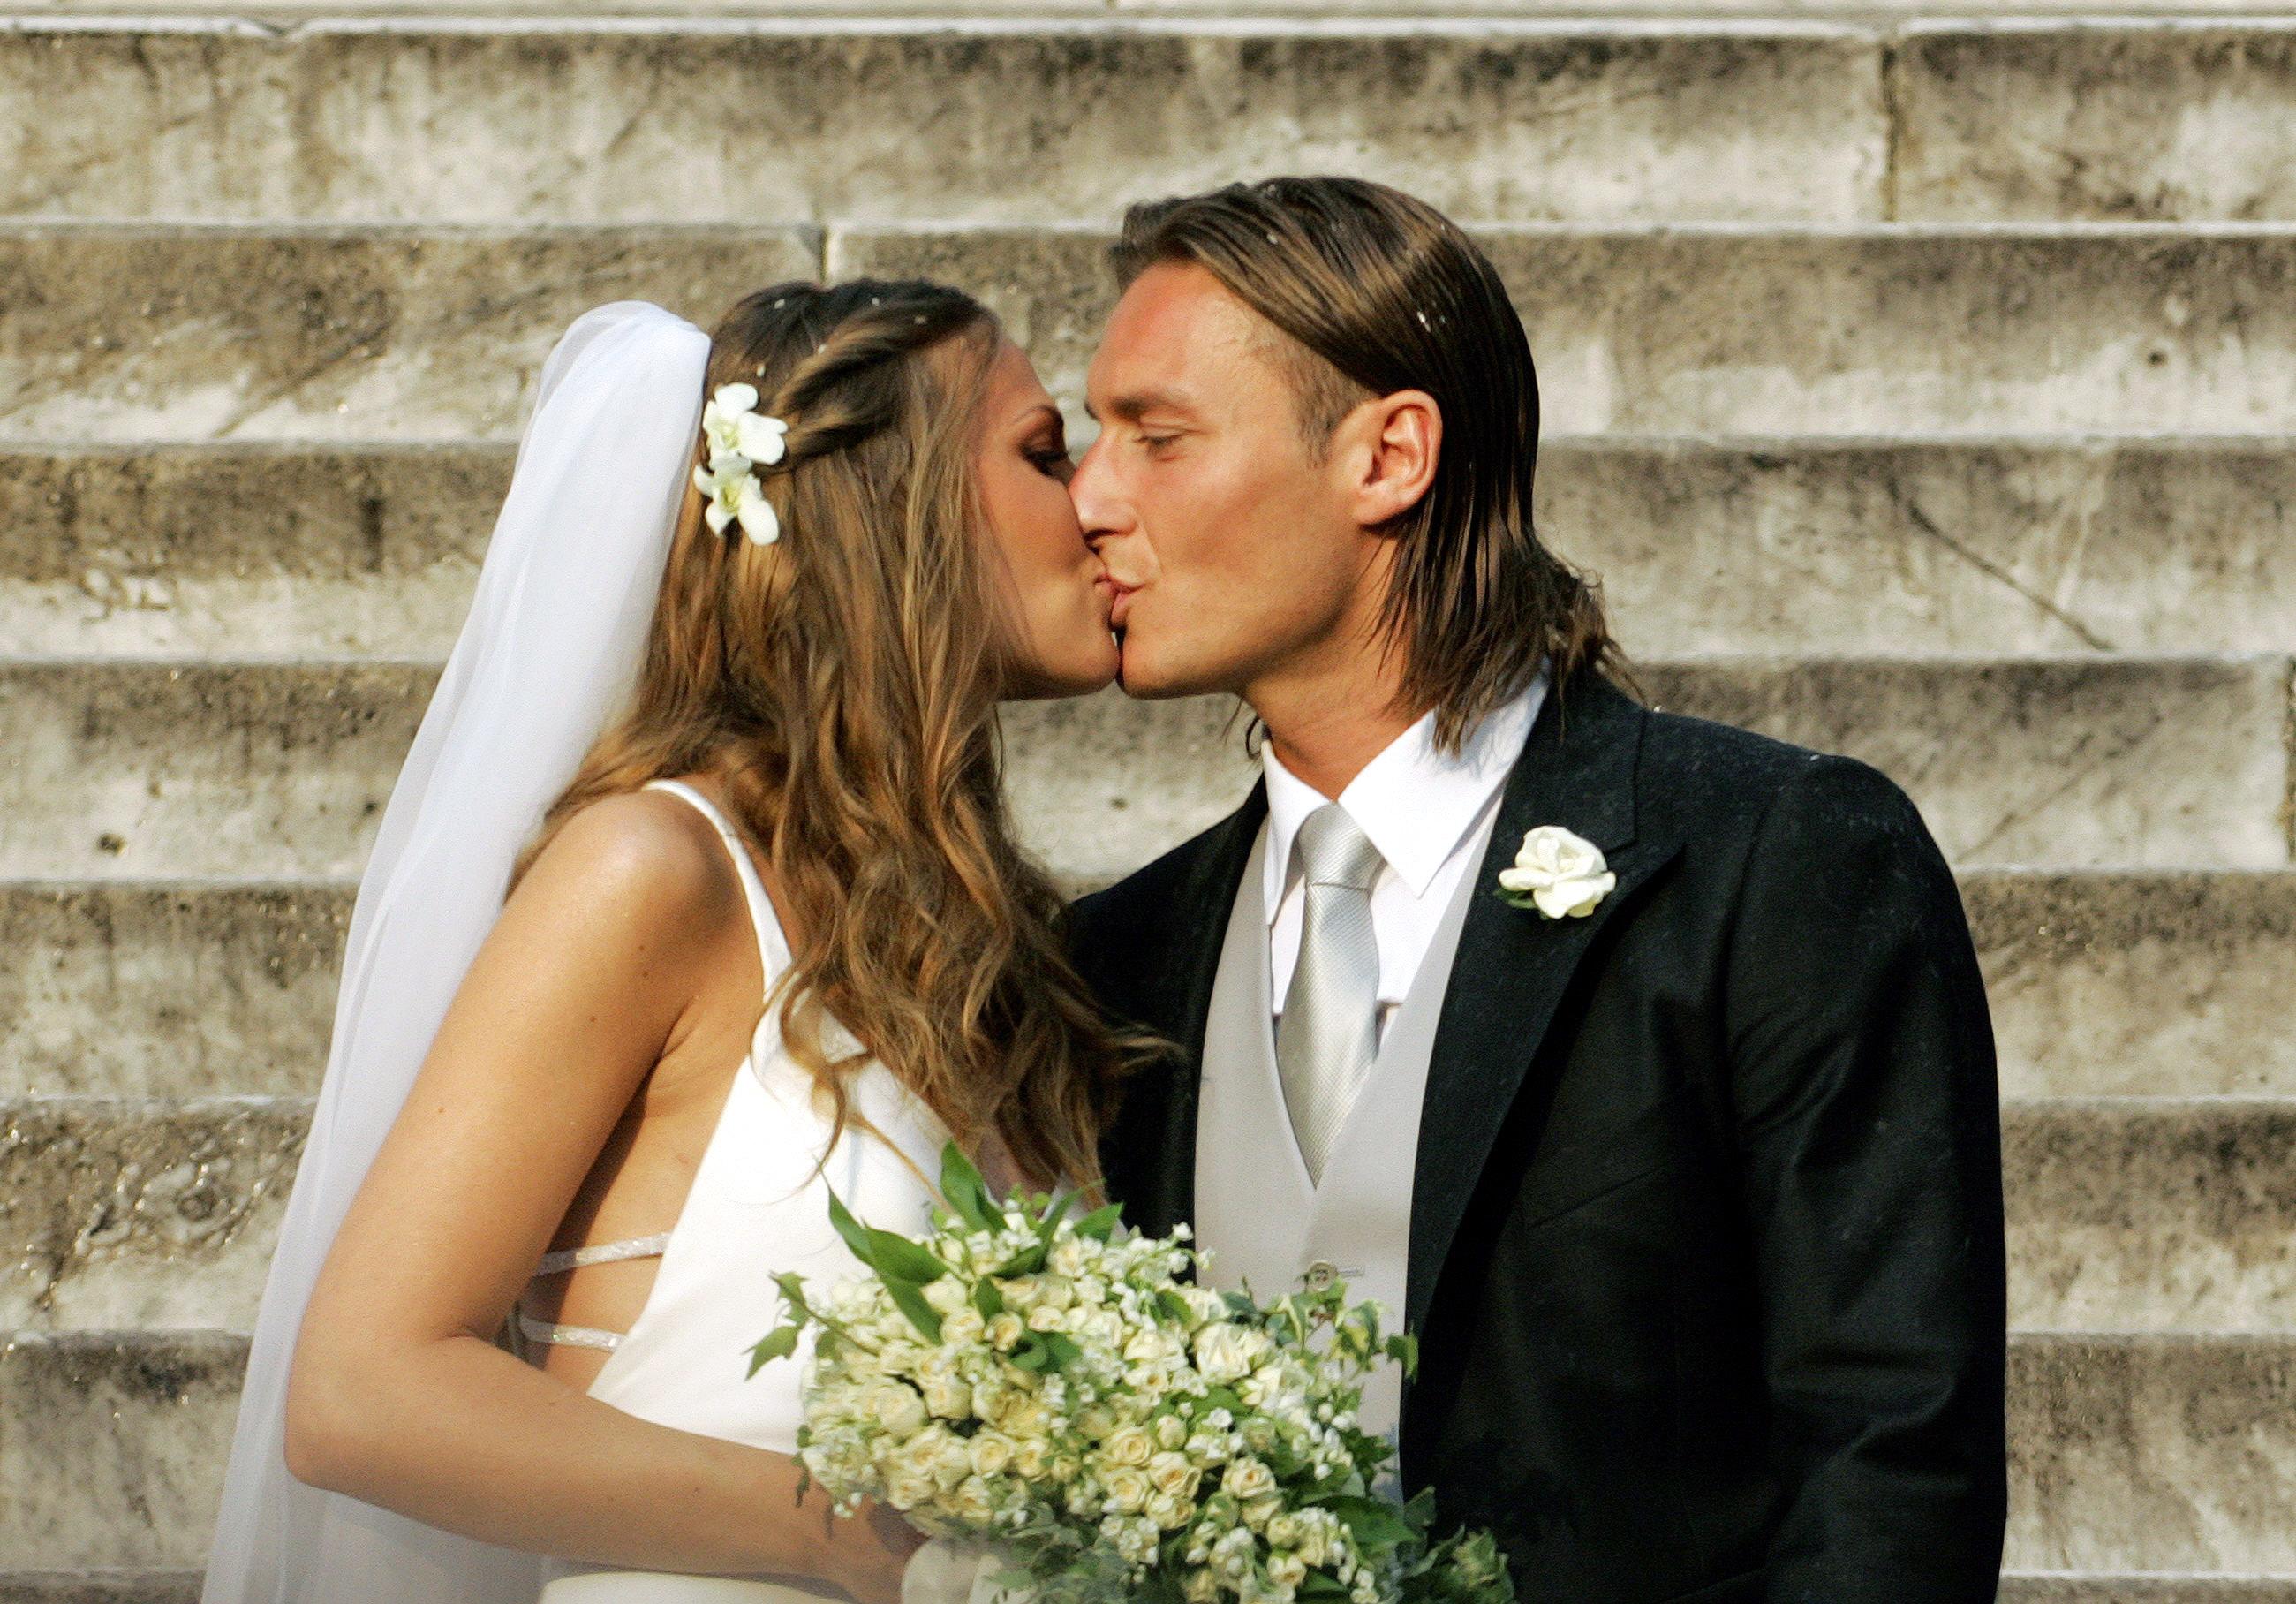 Francesco Totti Wedding